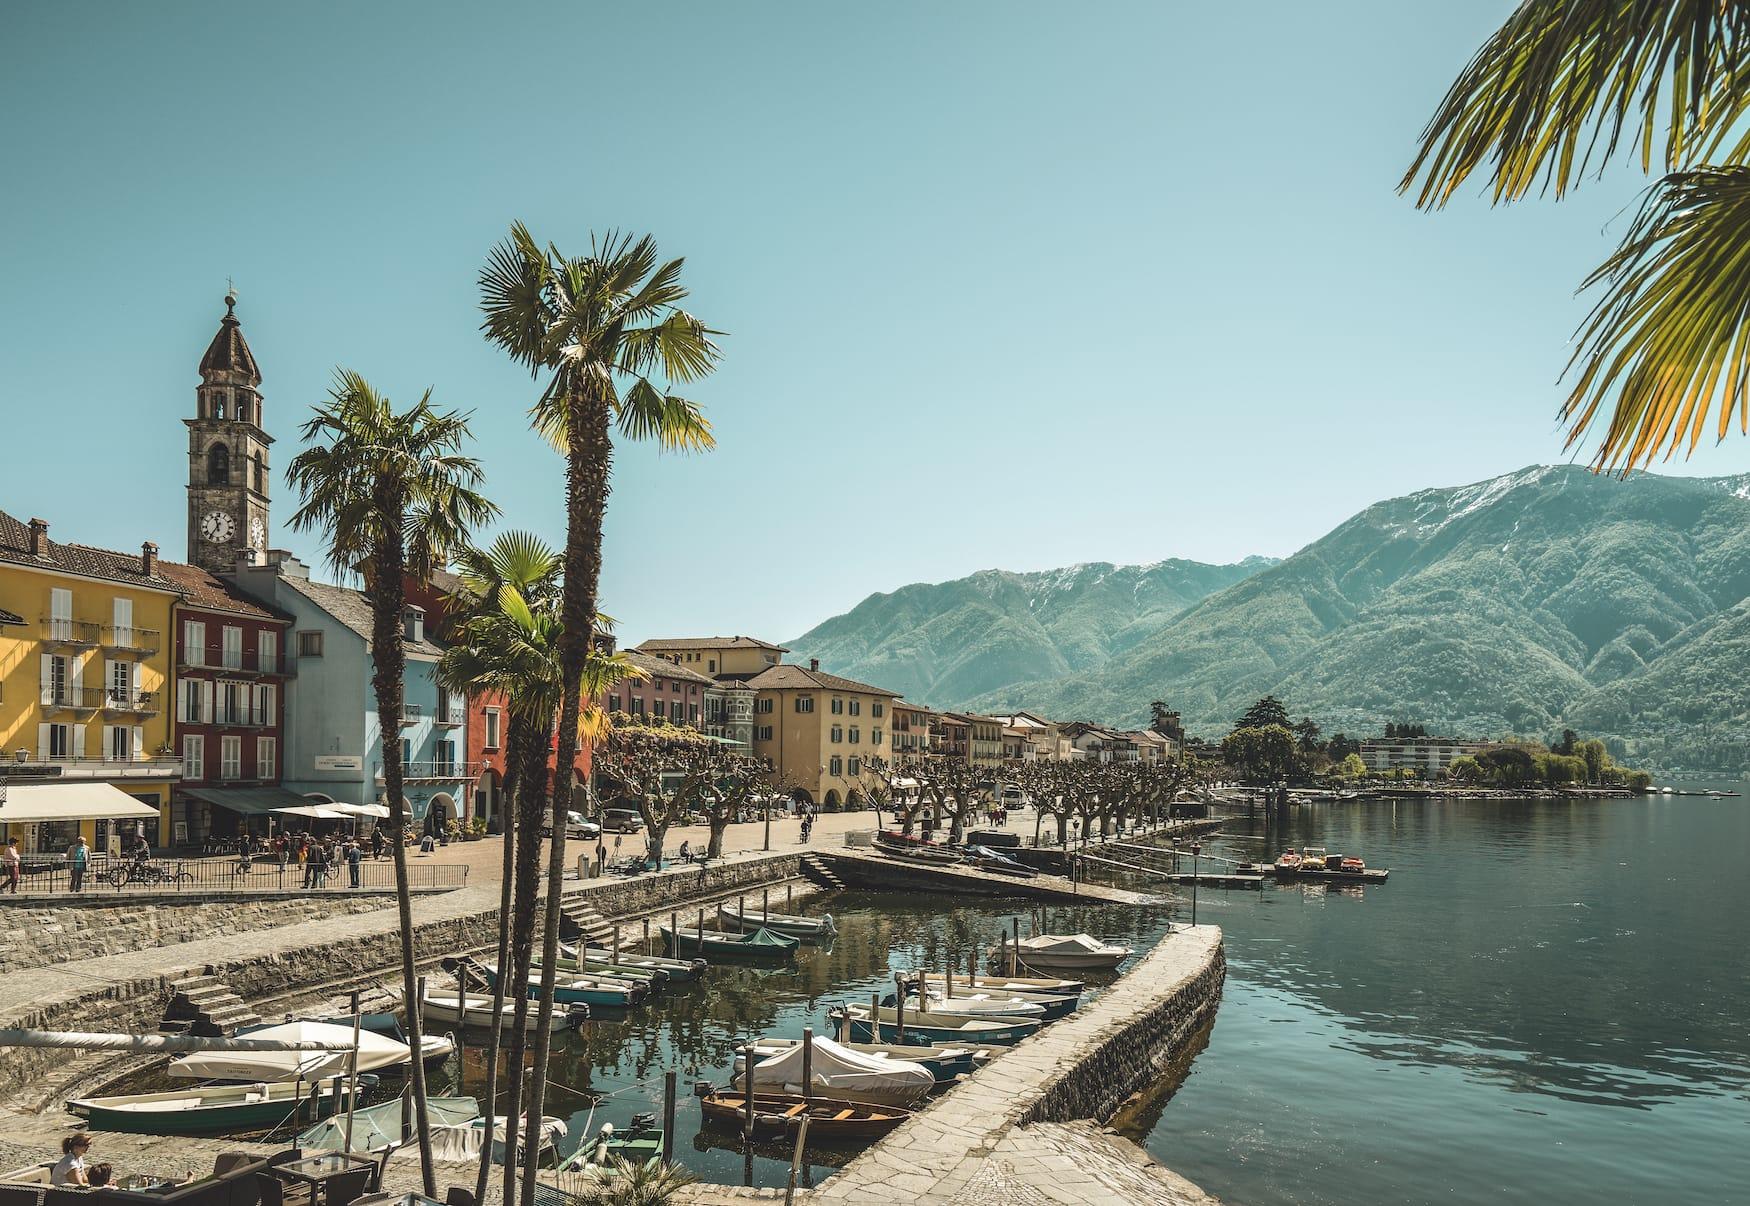 Frühlingserwachen an der Seepromenade in Ascona